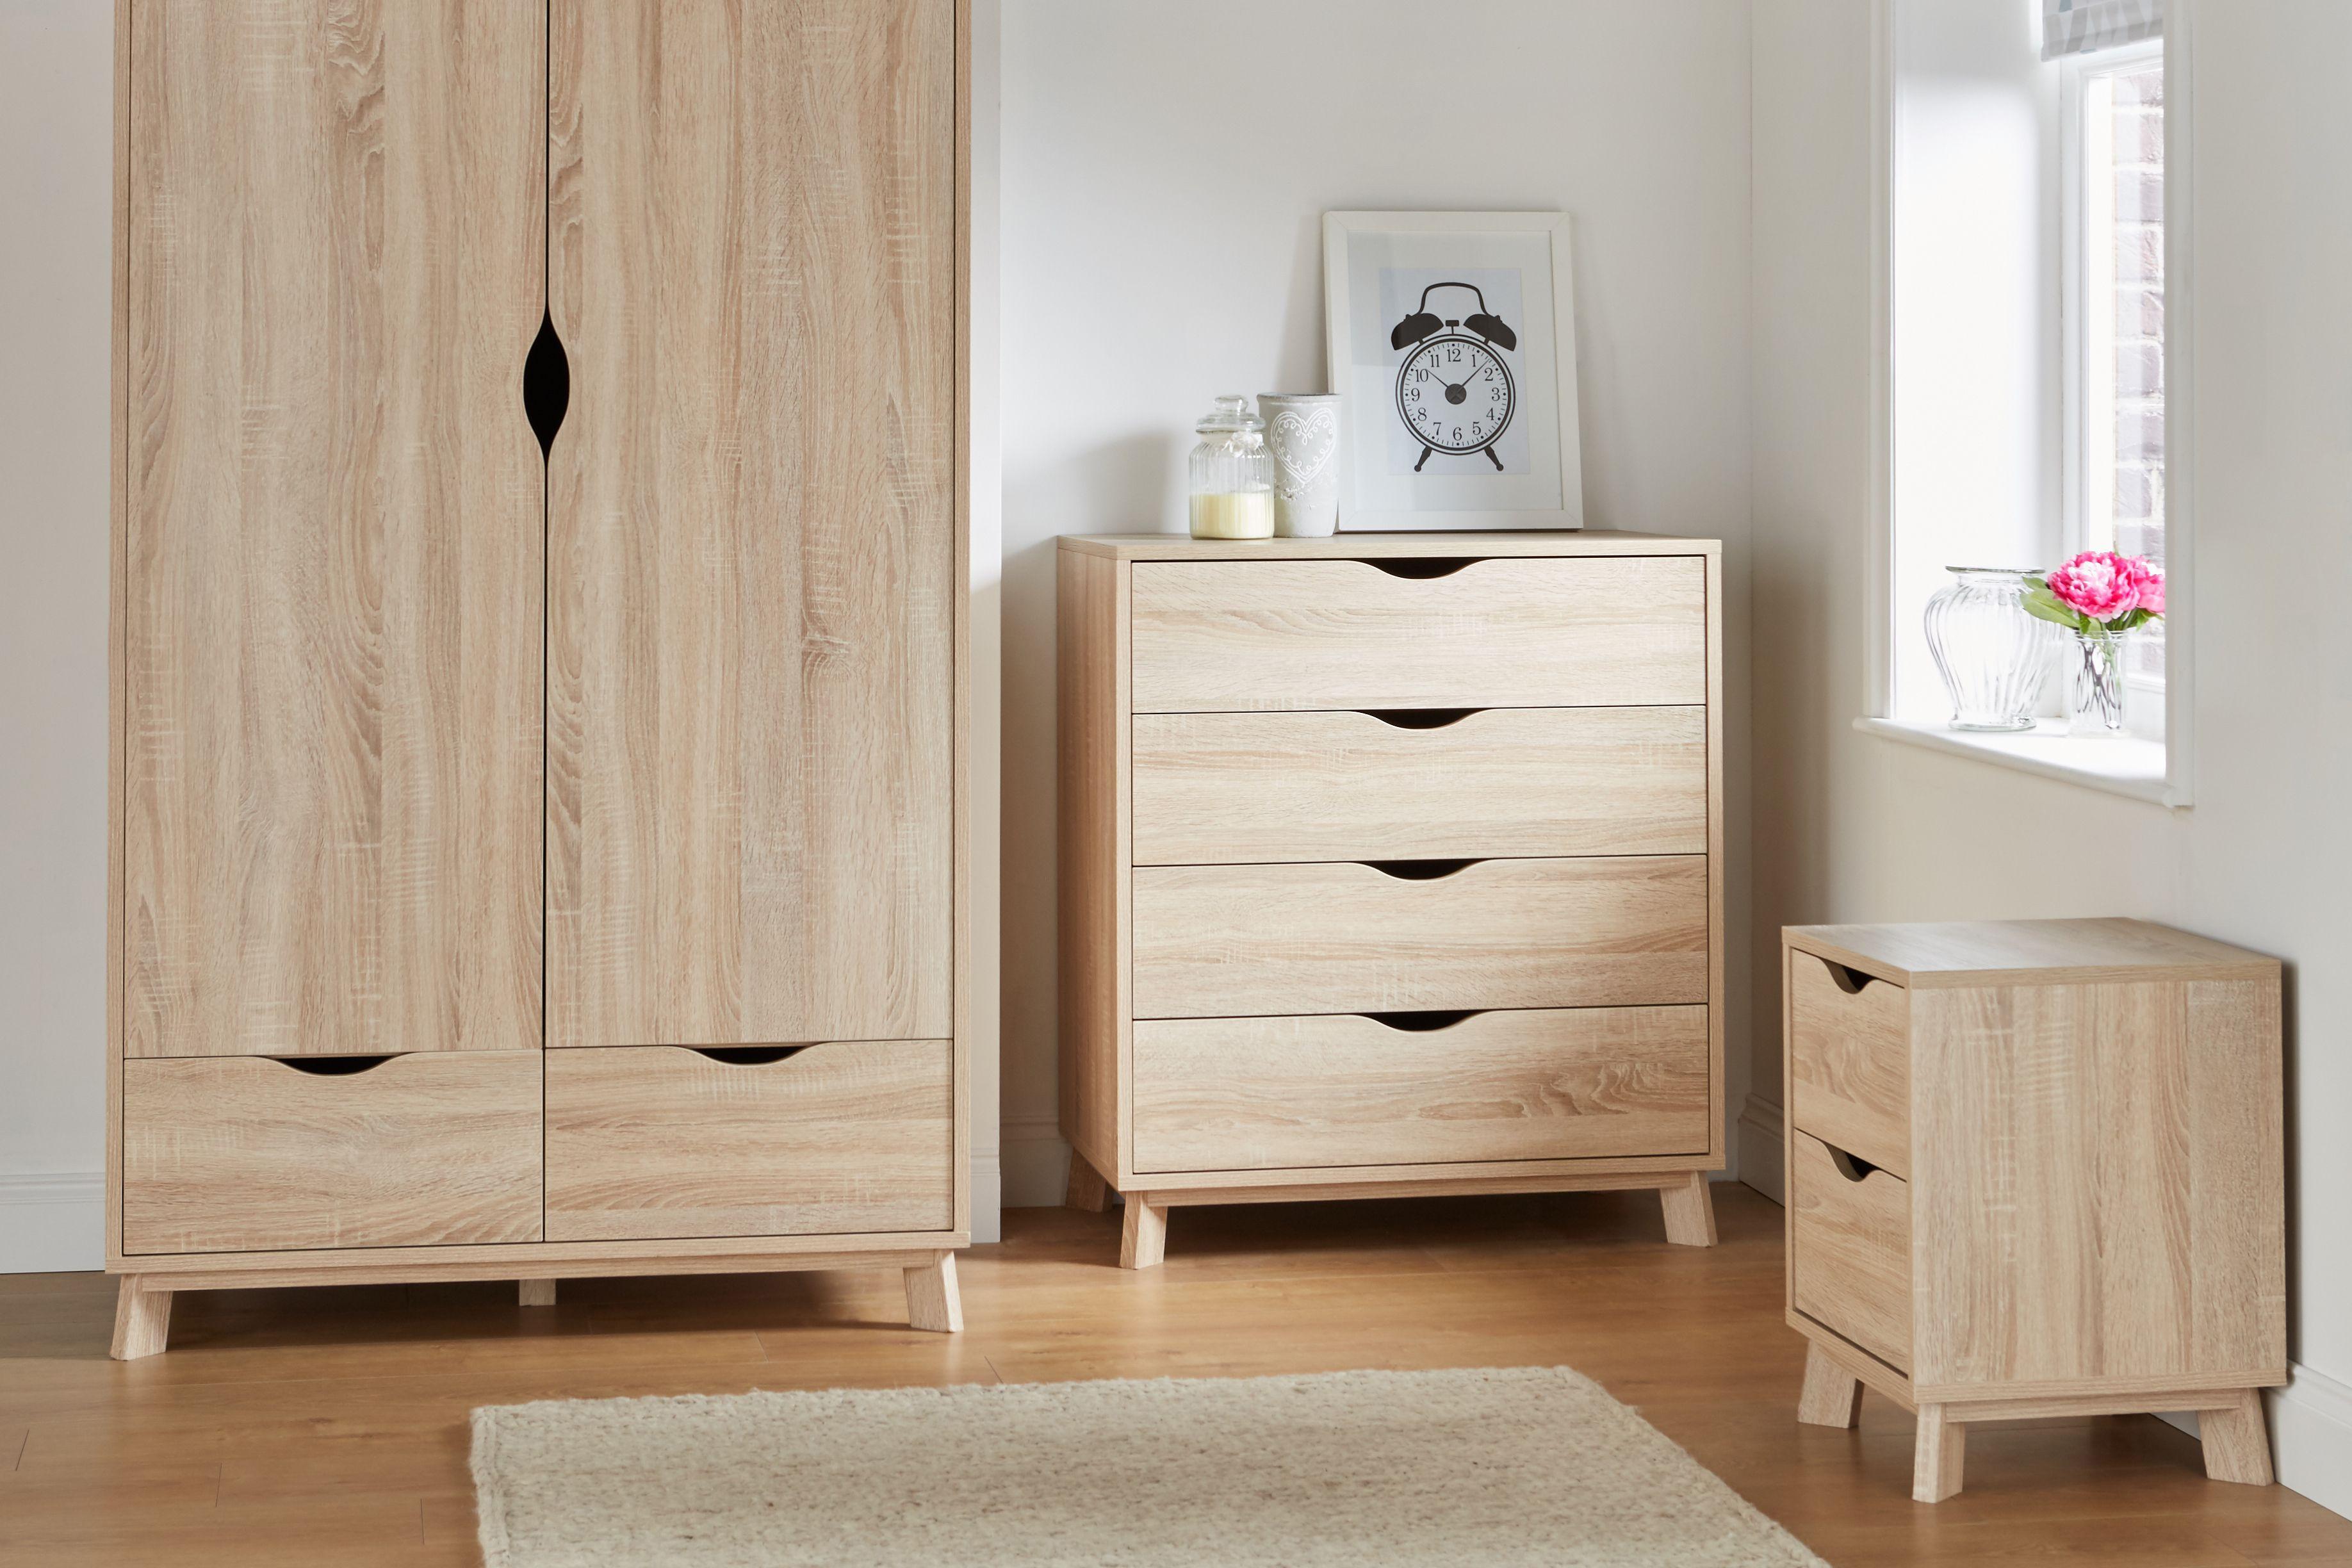 Bedroom furniture setsBedroom Furniture  Next  Renovate Your Modern Home Design With  . Kensington High Gloss Bedroom Furniture Collection. Home Design Ideas